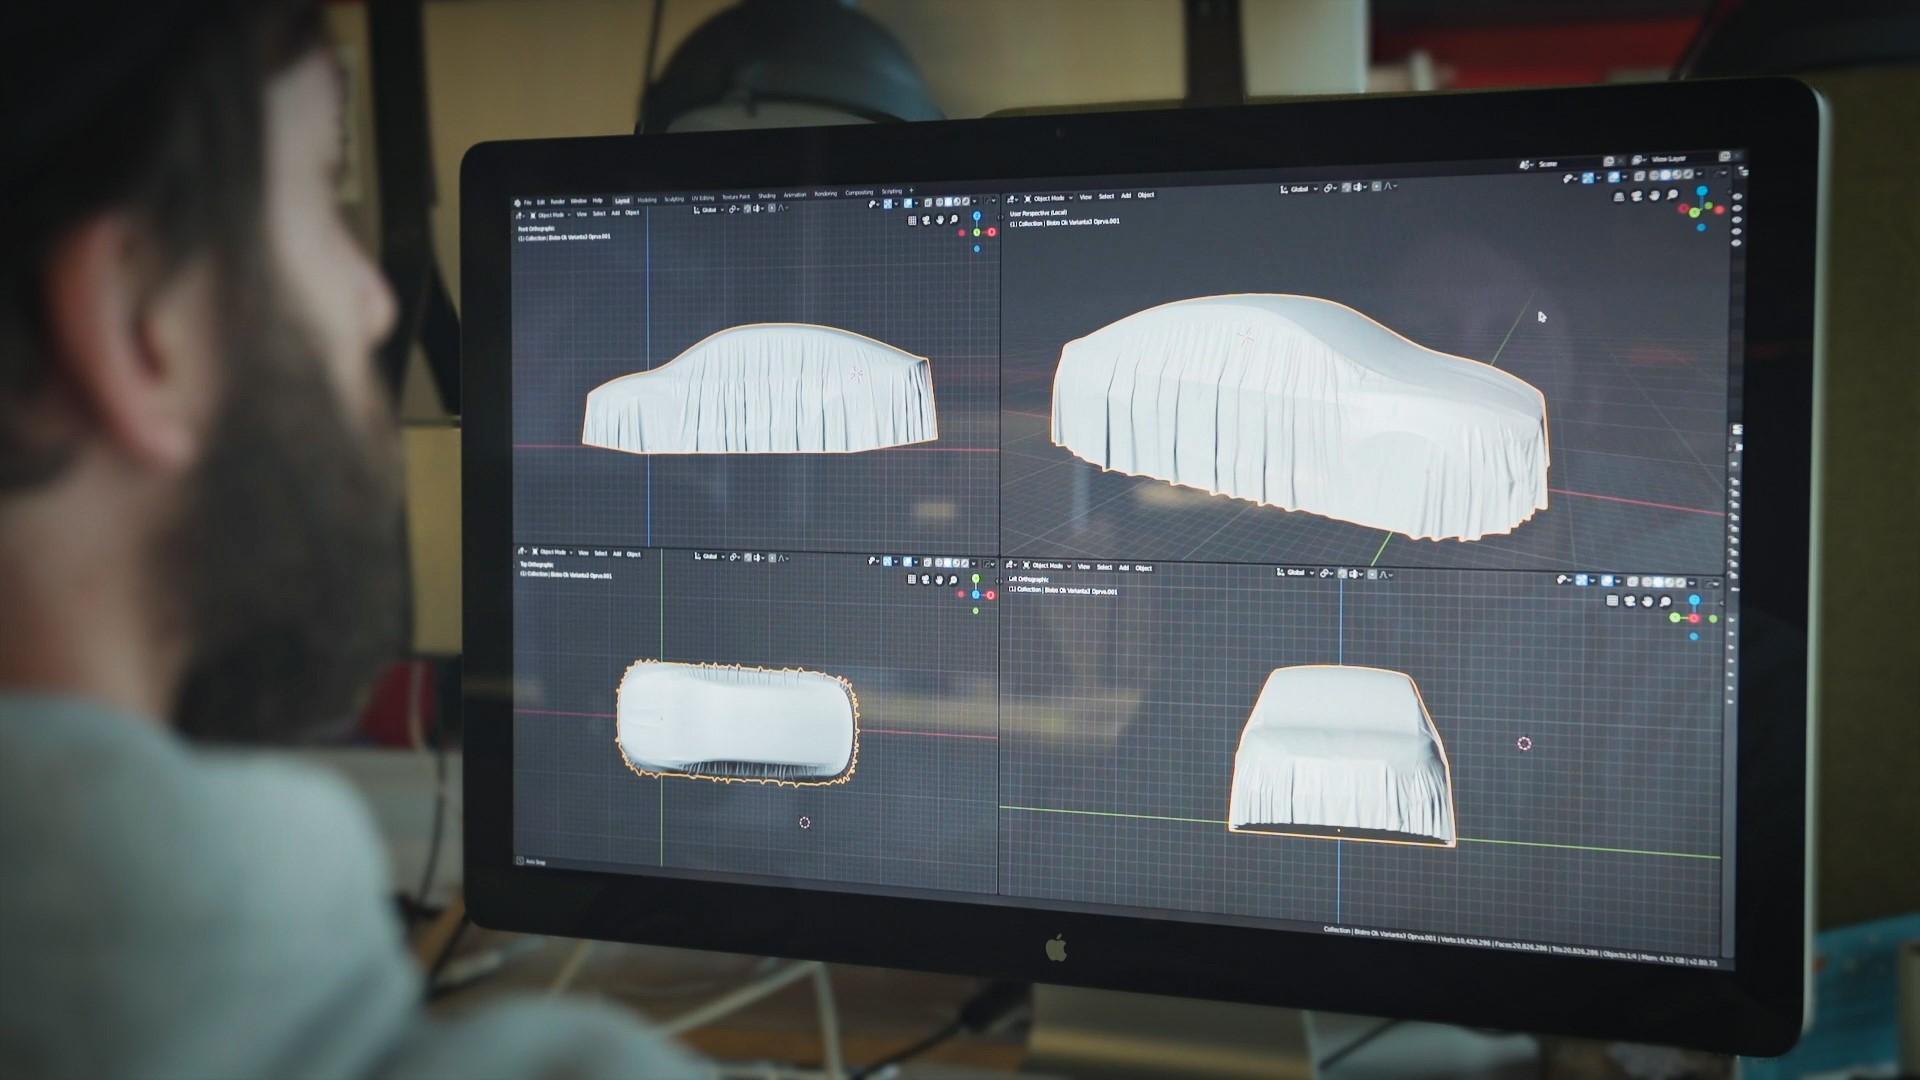 skoda-computer-egv-test-view